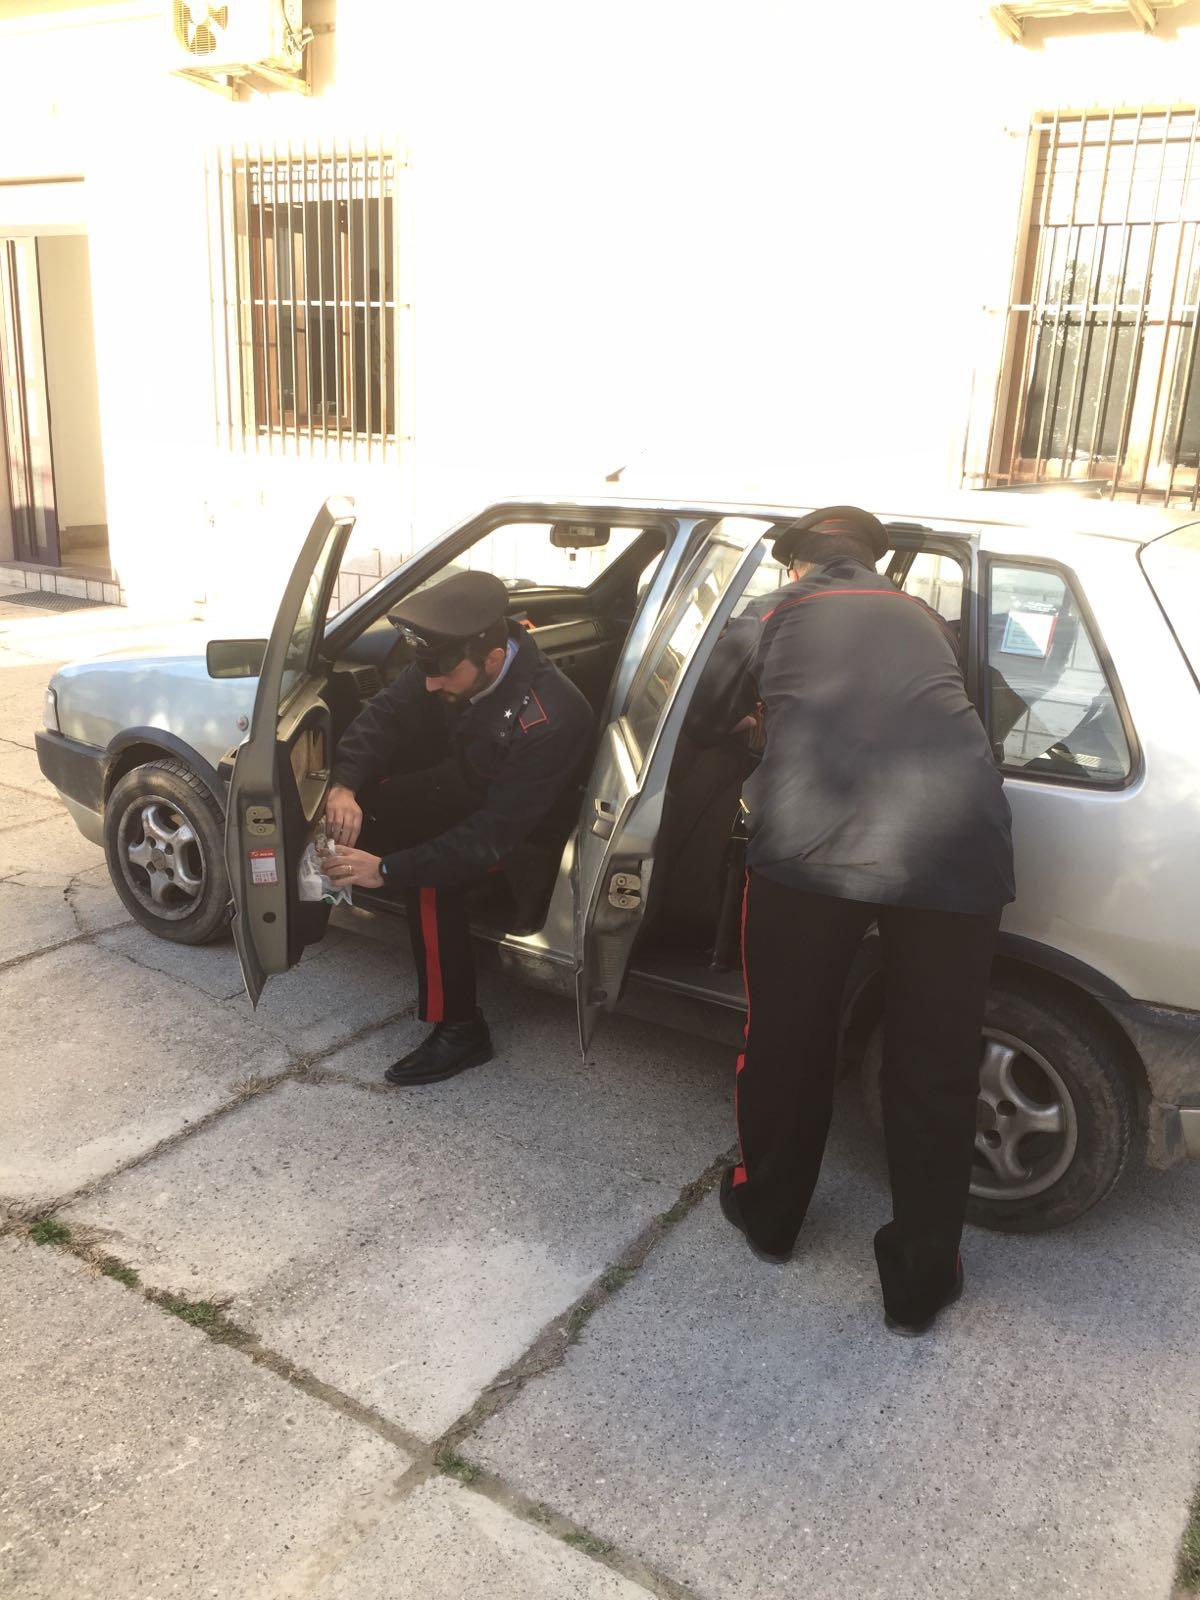 carabinieri perquisizione auto